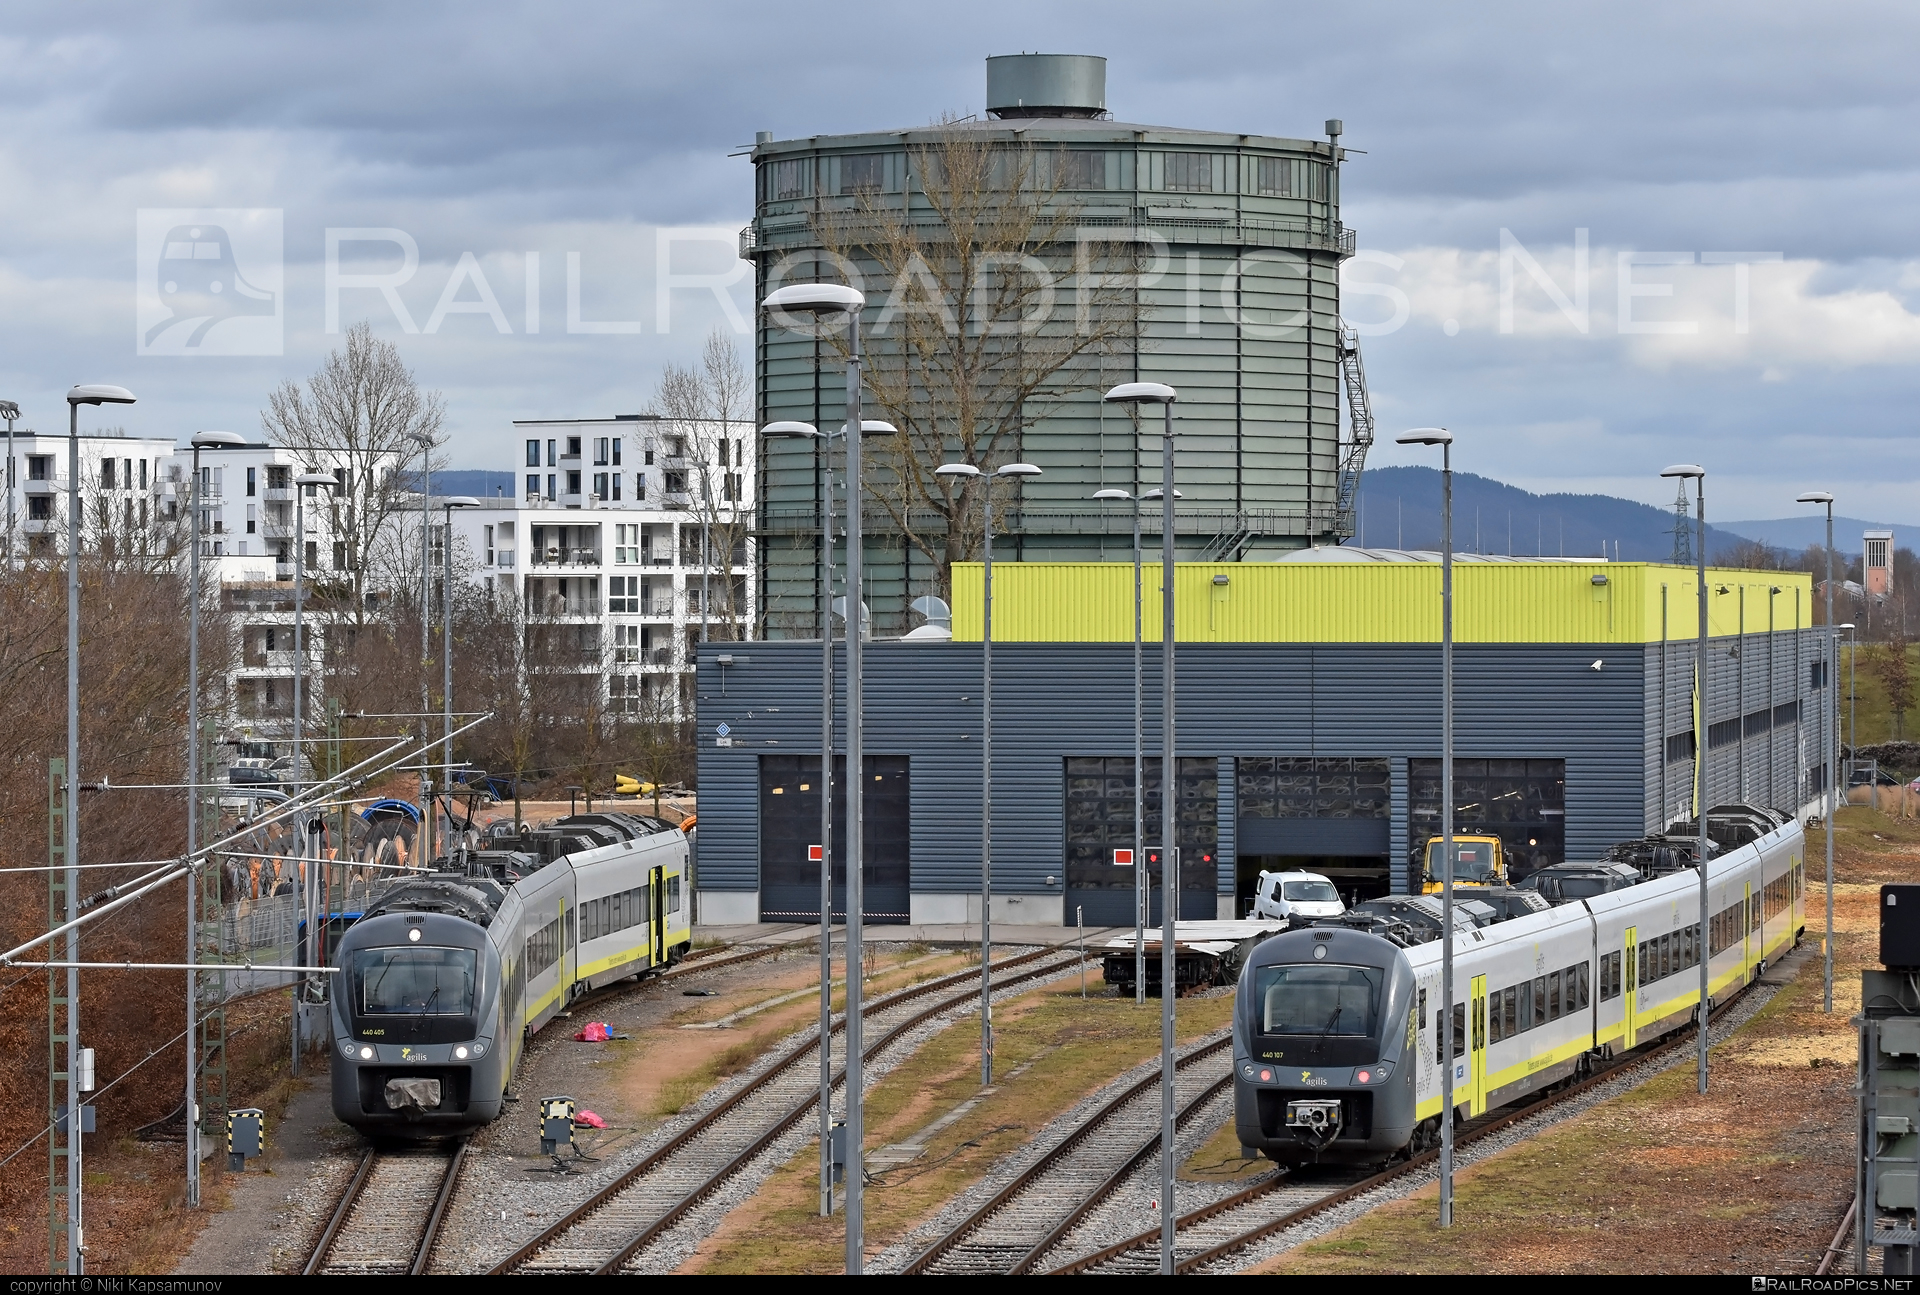 Alstom Coradia Continental - 440 107 operated by Agilis Verkersgesellschaft mbH & Co KG #agilis #agilisverkersgesellschaft #alstom #alstomcoradia #alstomcoradiacontinental